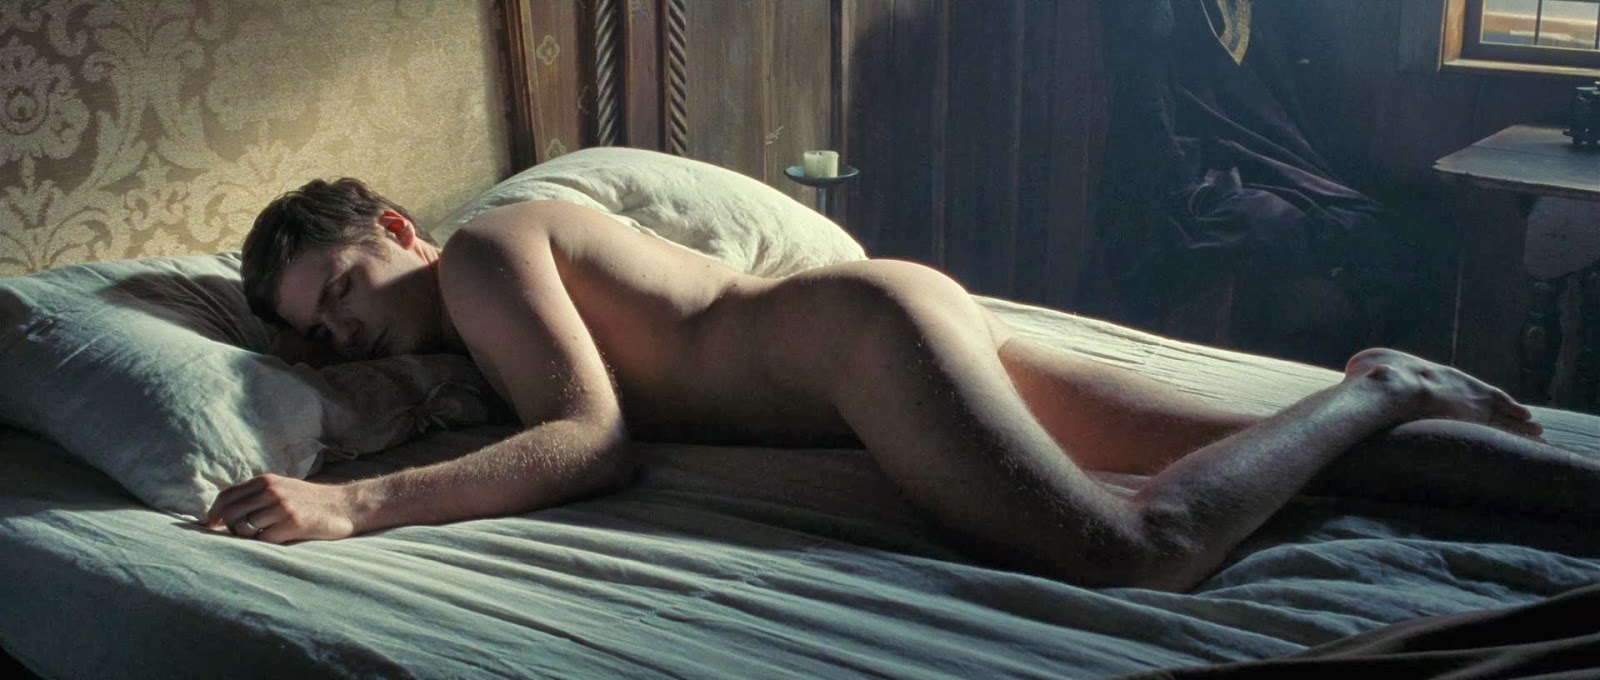 Heidi Brühl Nude heidi bruehl nude pictures photos playboy naked topless